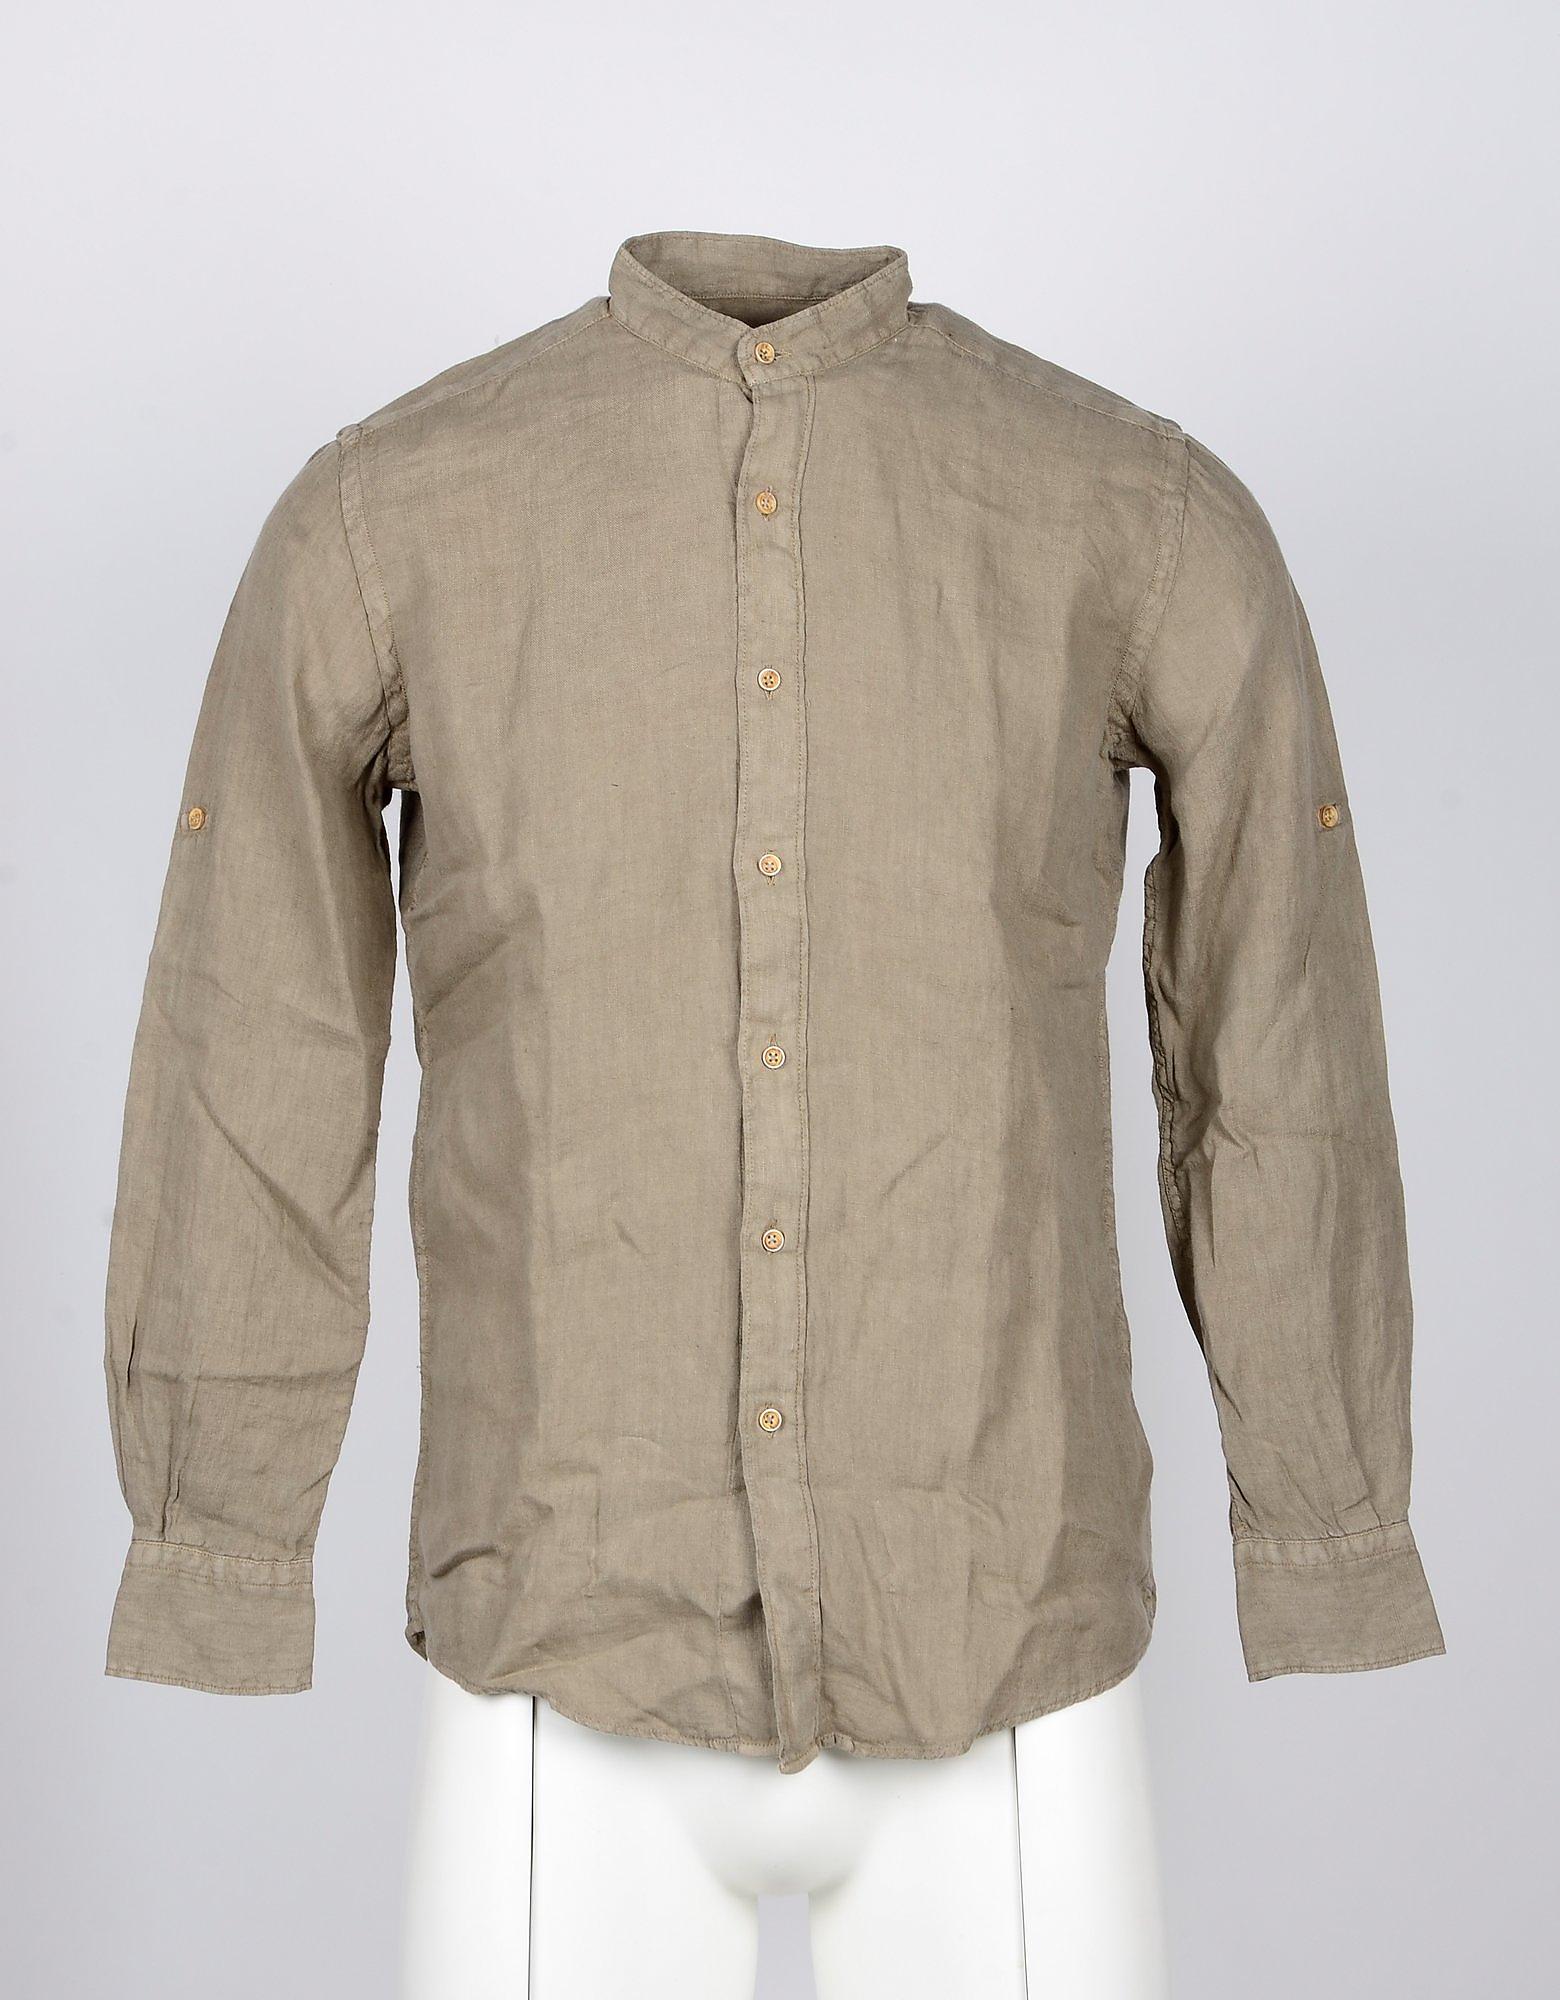 Takeshy Kurosawa Designer Shirts, Mandarin Collar Beige Linen Men's Shirt